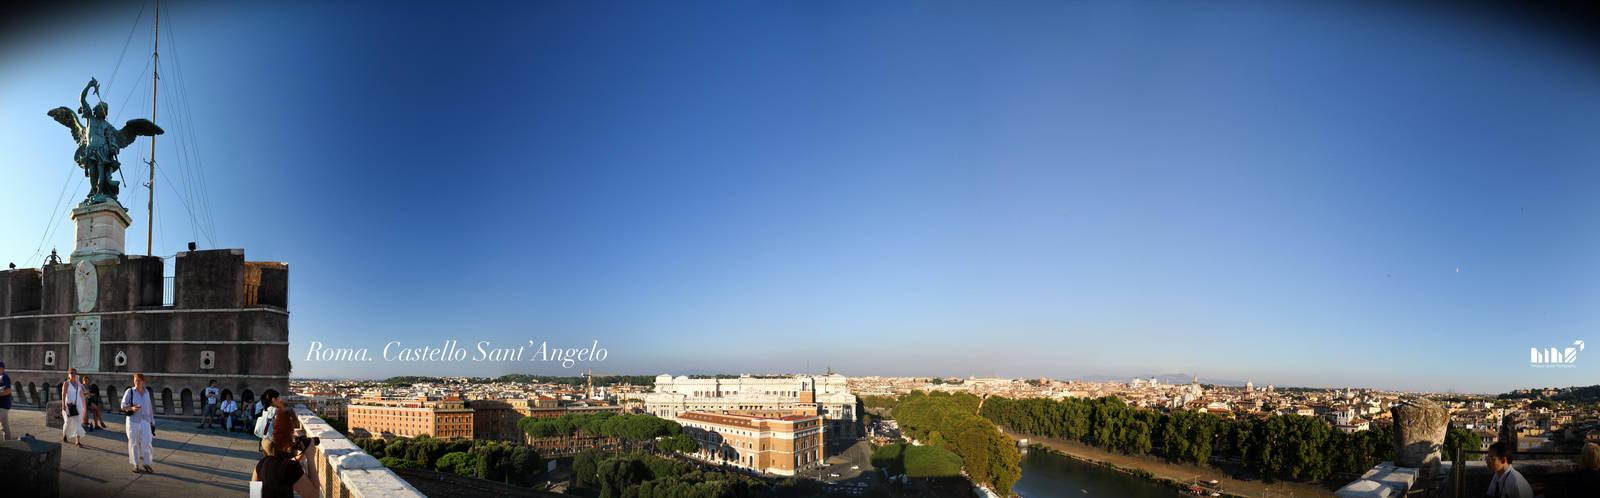 Roma - Castello Sant'Angelo by N1cn4c